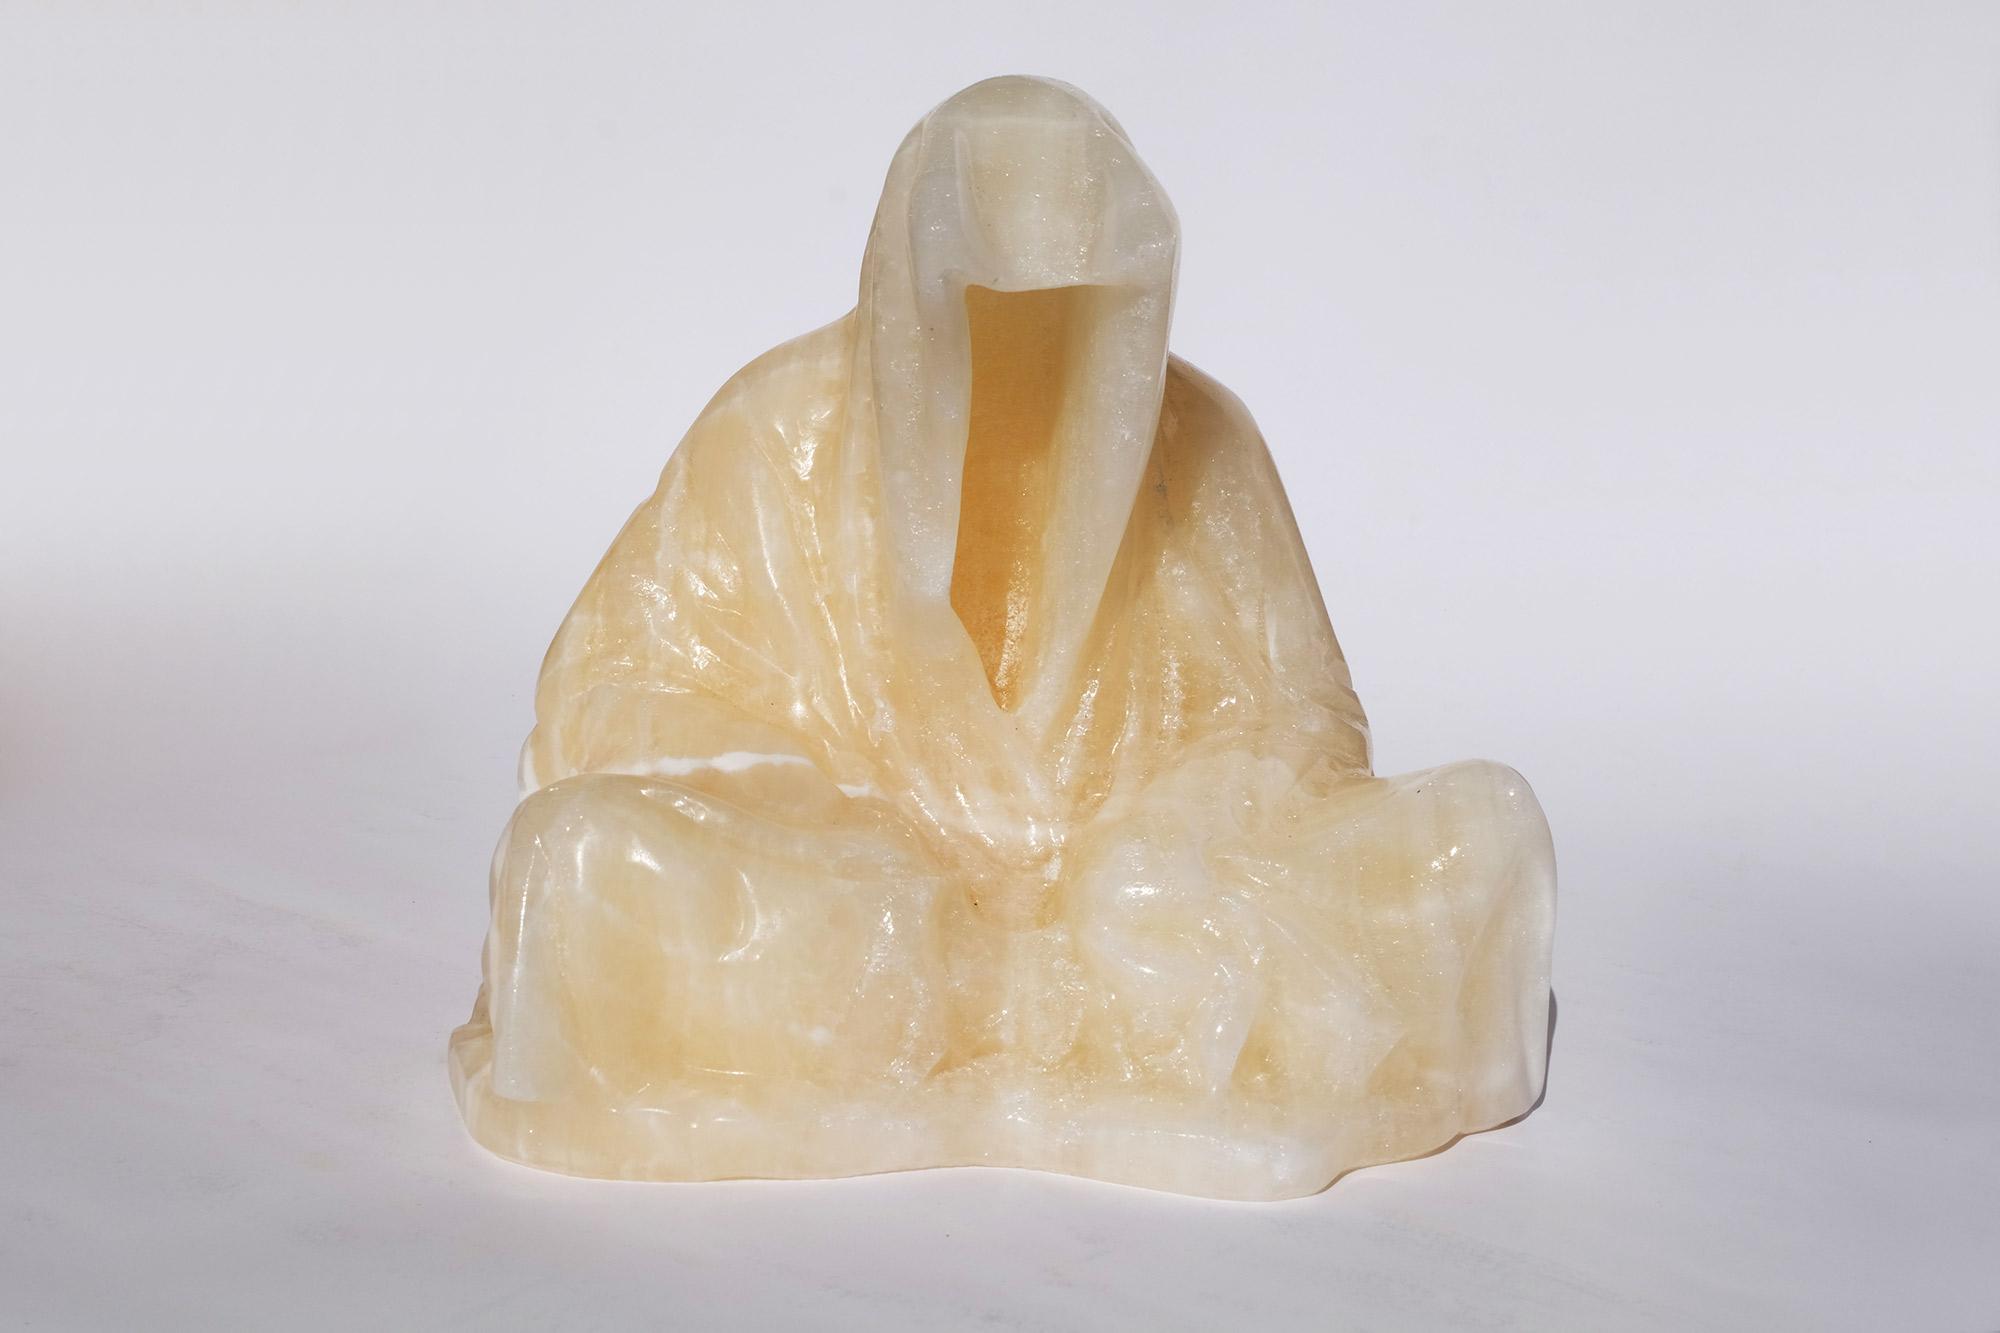 onyx-marble-stone-rock-guardians-of-time-manfred-kielnhofer-contemporary-art-modern-arts-fine-art-design-sculpture-statue-show-gallery-3875a